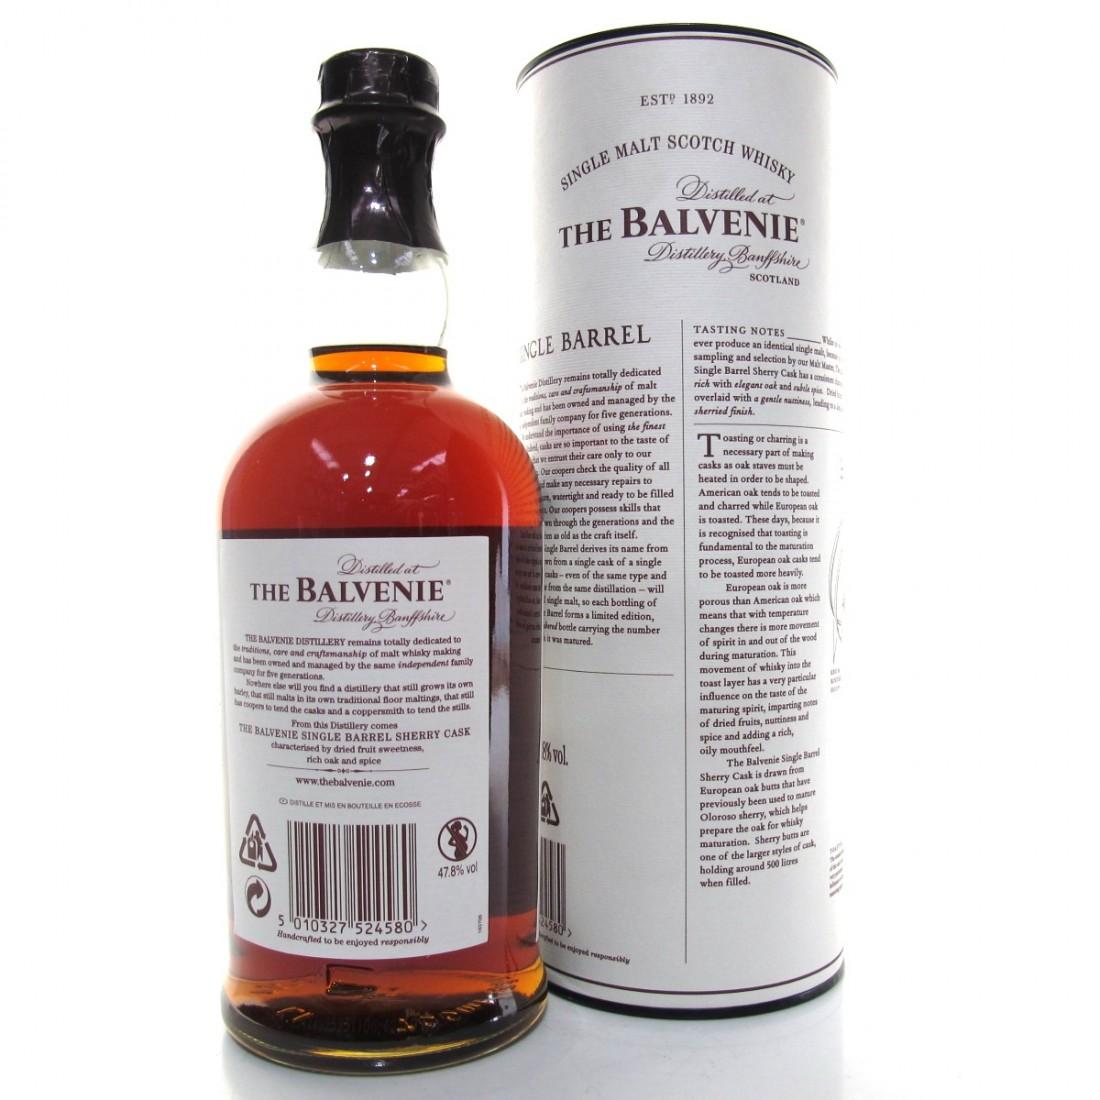 Balvenie 15 Year Old Single Barrel / Sherry Cask